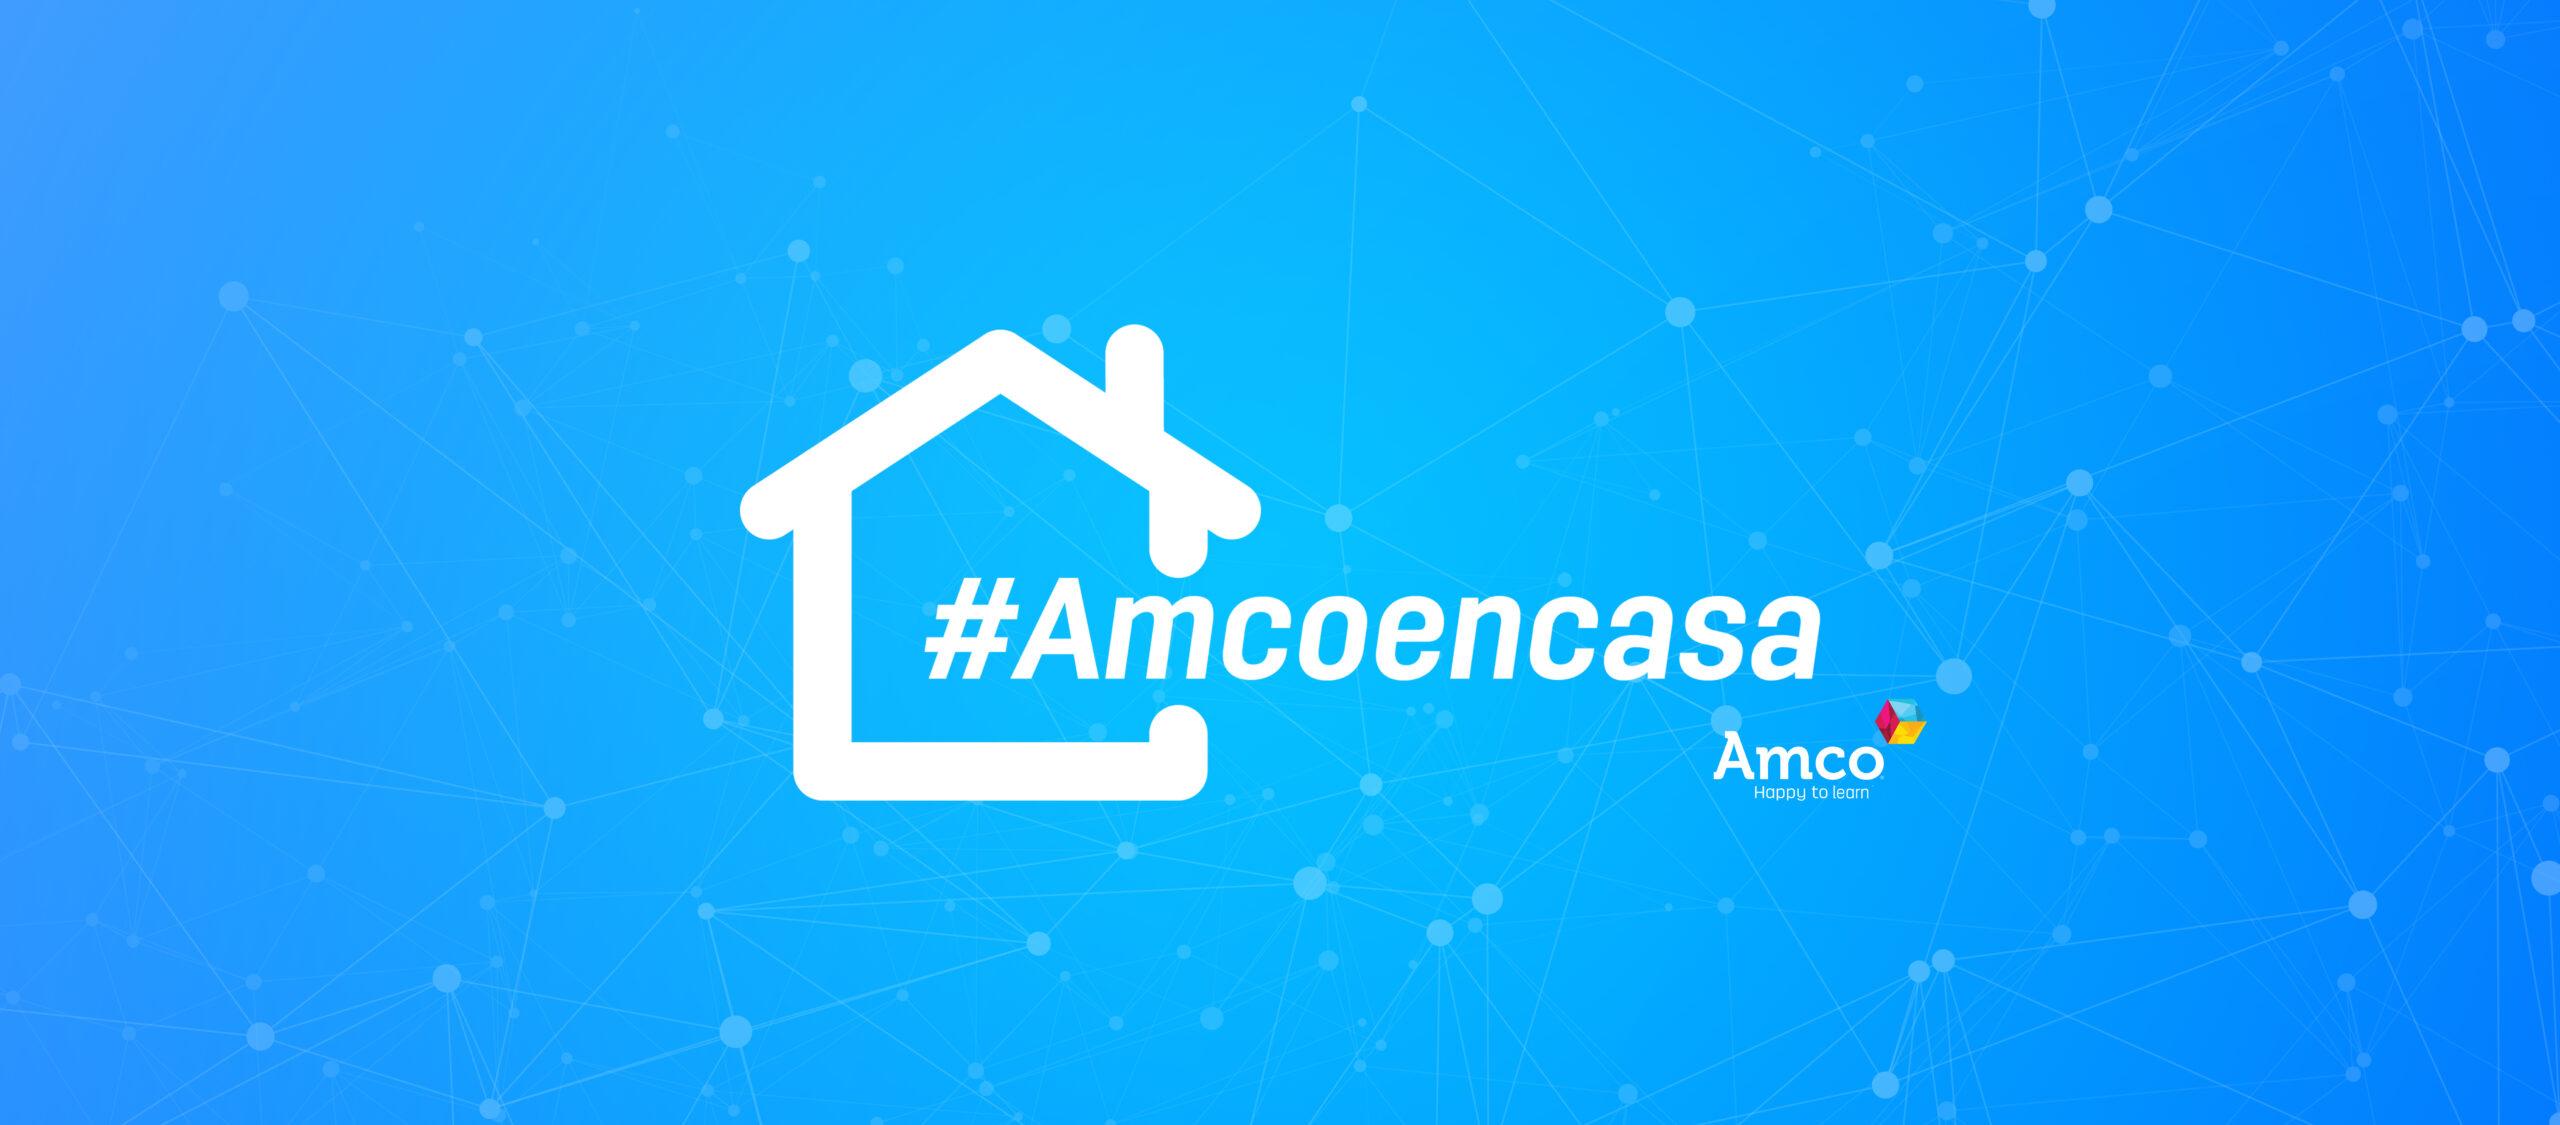 Amcoencasa